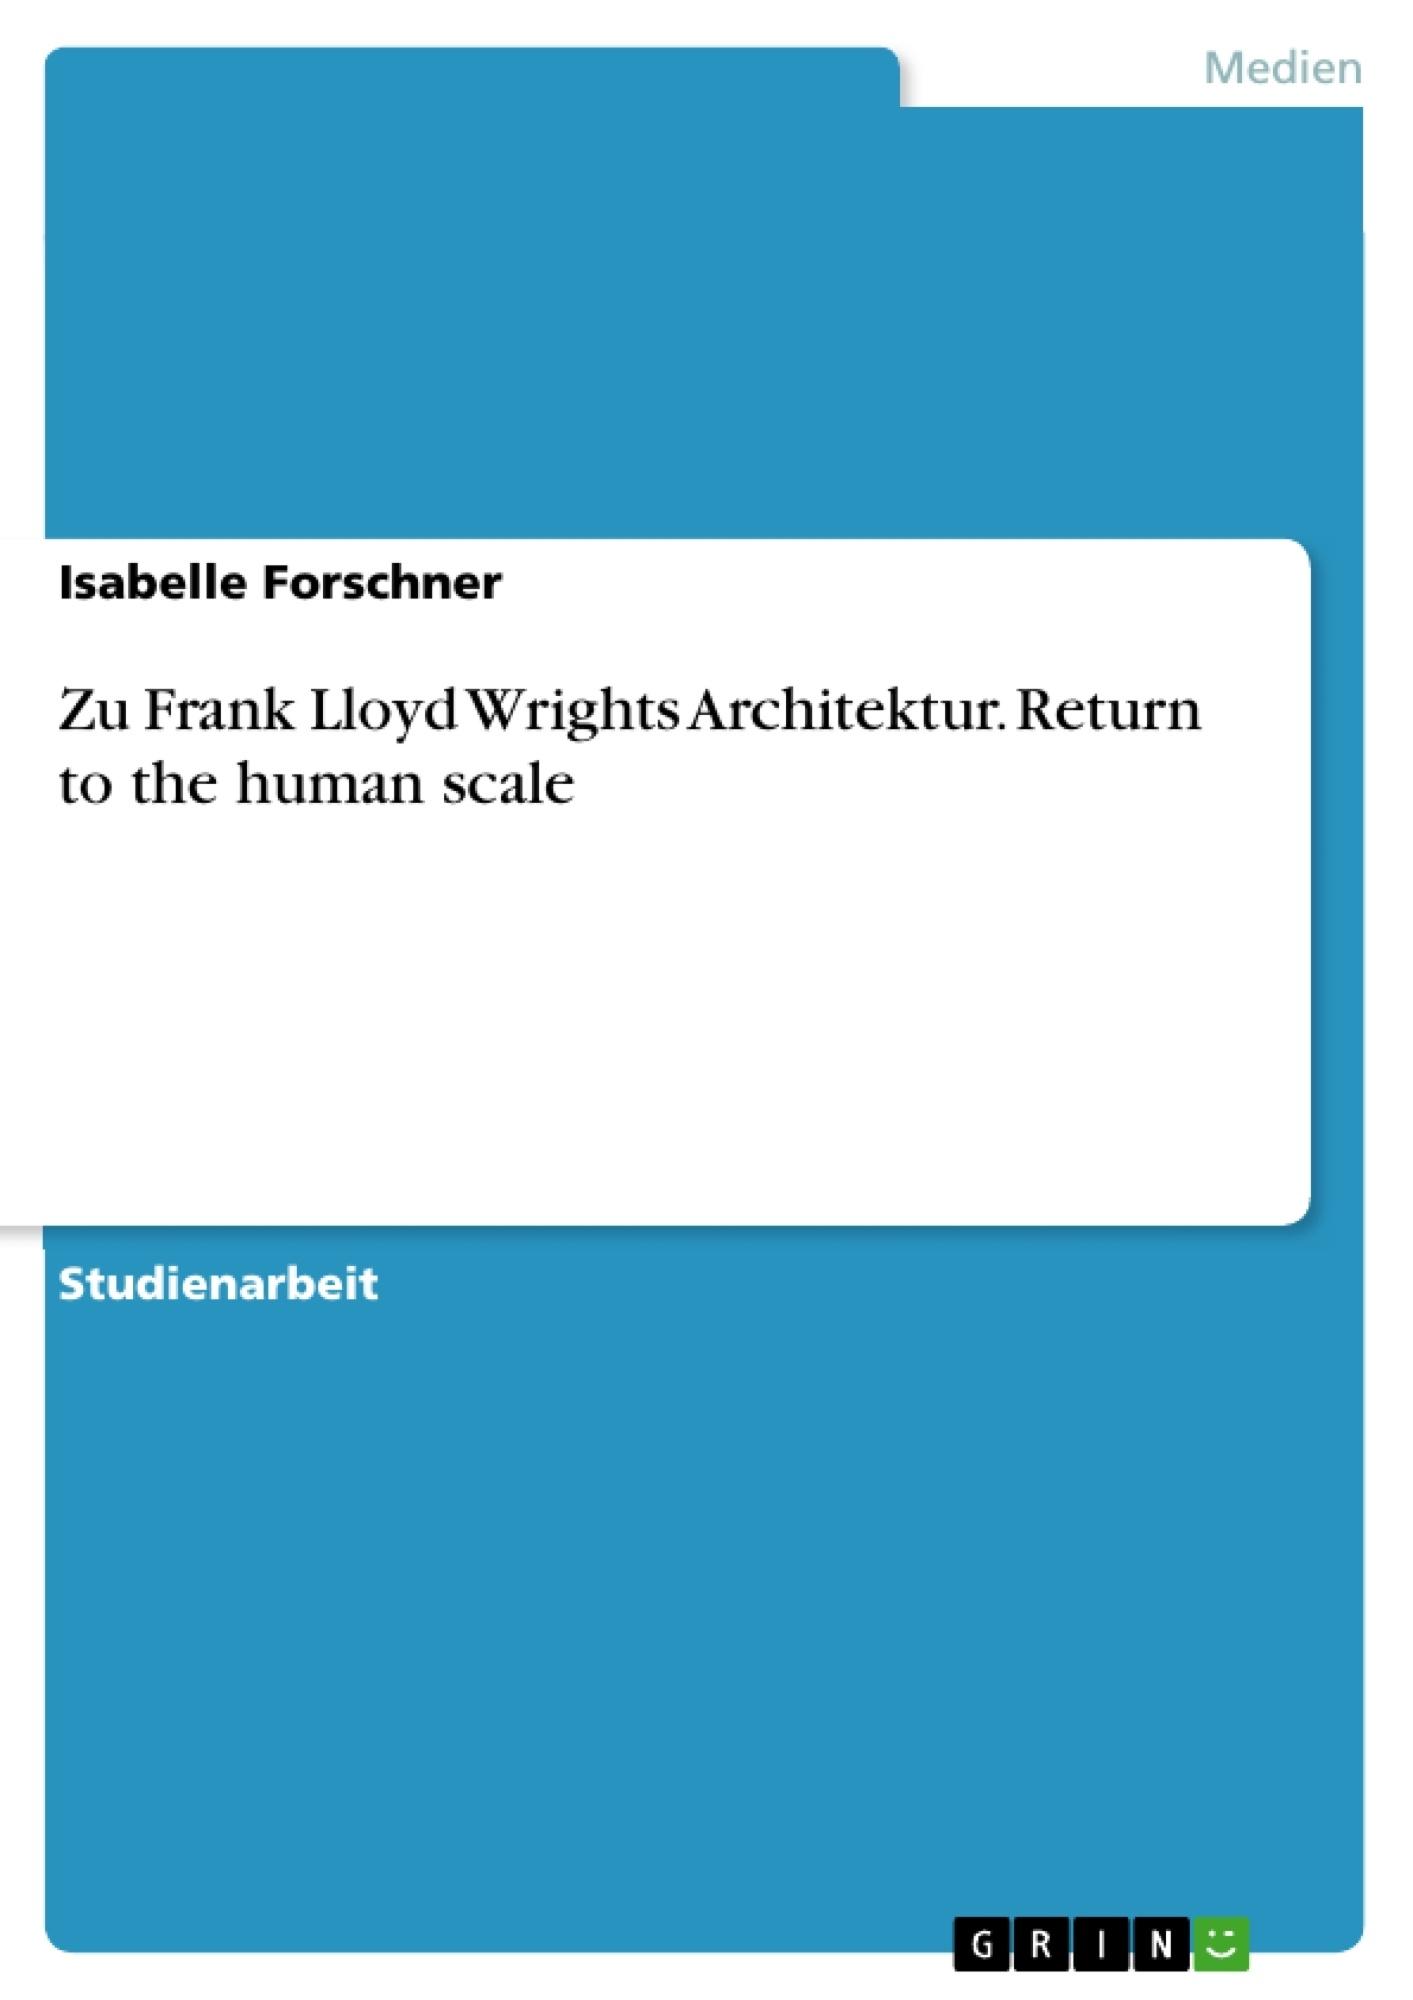 Titel: Zu Frank Lloyd Wrights Architektur. Return to the human scale